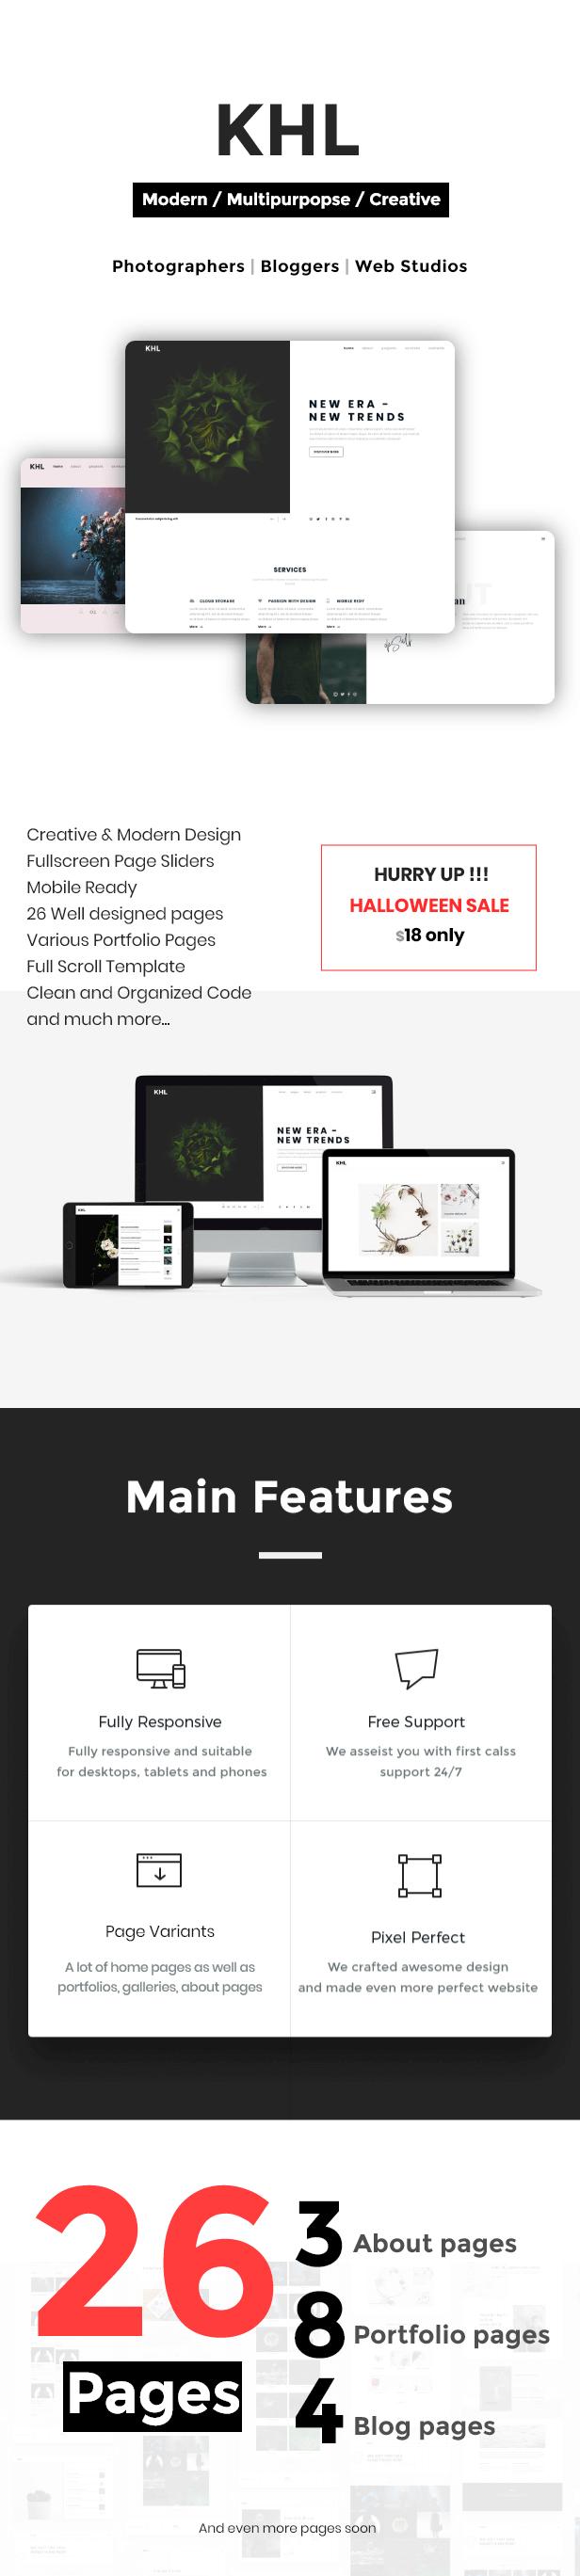 KHL - Modern, Multipurpose, Minimal HTML5 Template - 1